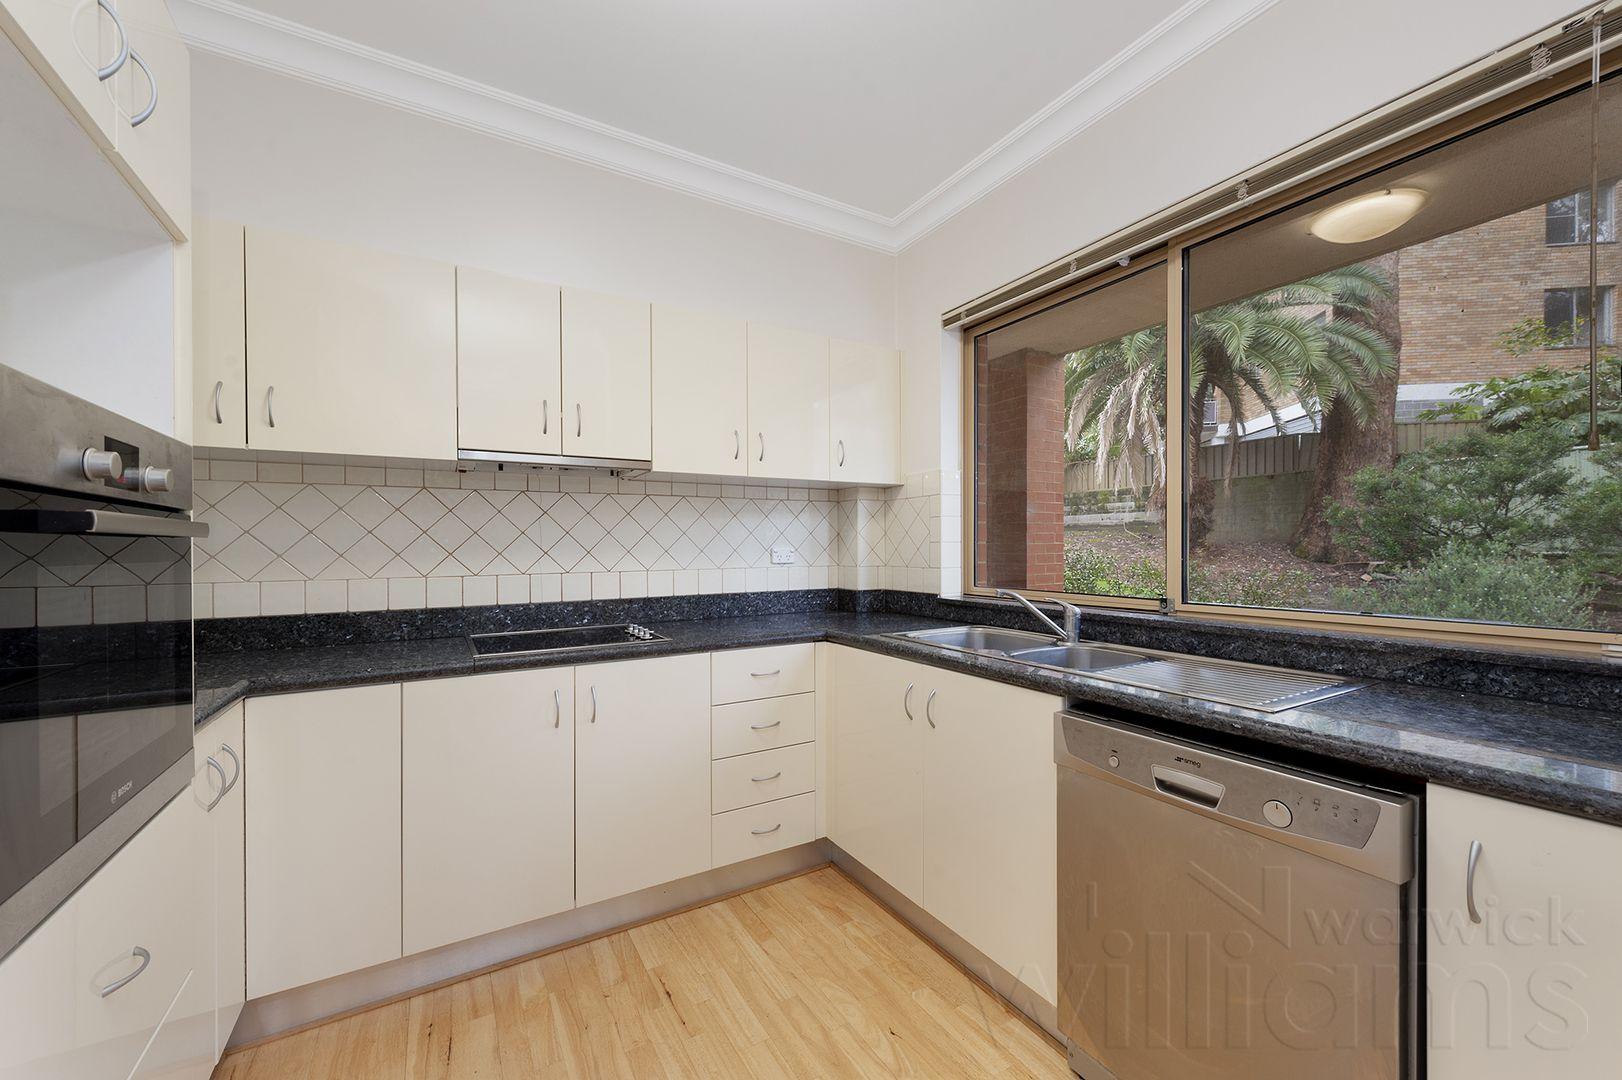 7/1-5 Huxtable Avenue, Lane Cove North NSW 2066, Image 2